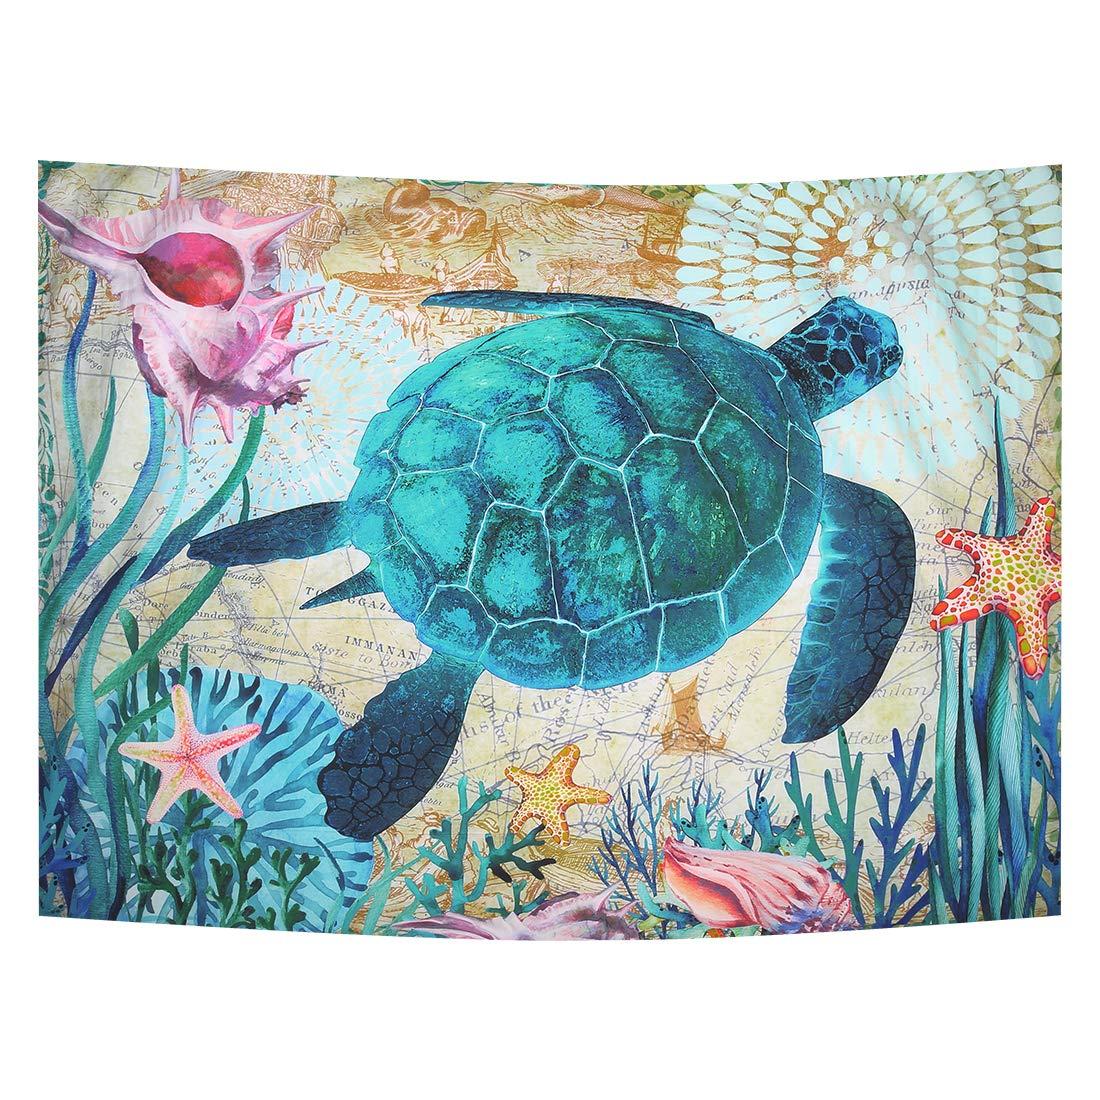 Zeronal ウミガメタペストリー 楽しい曼荼羅 壁掛けタペストリー 壁アート装飾 ビーチ/ソファーカバーアップ テーブルランナー/布 ホームデコレーション 59 x 79 inch(150cm x 200cm) ブルー 59 x 79 inch(150cm x 200cm) Turtle02 B07PLWWY4T